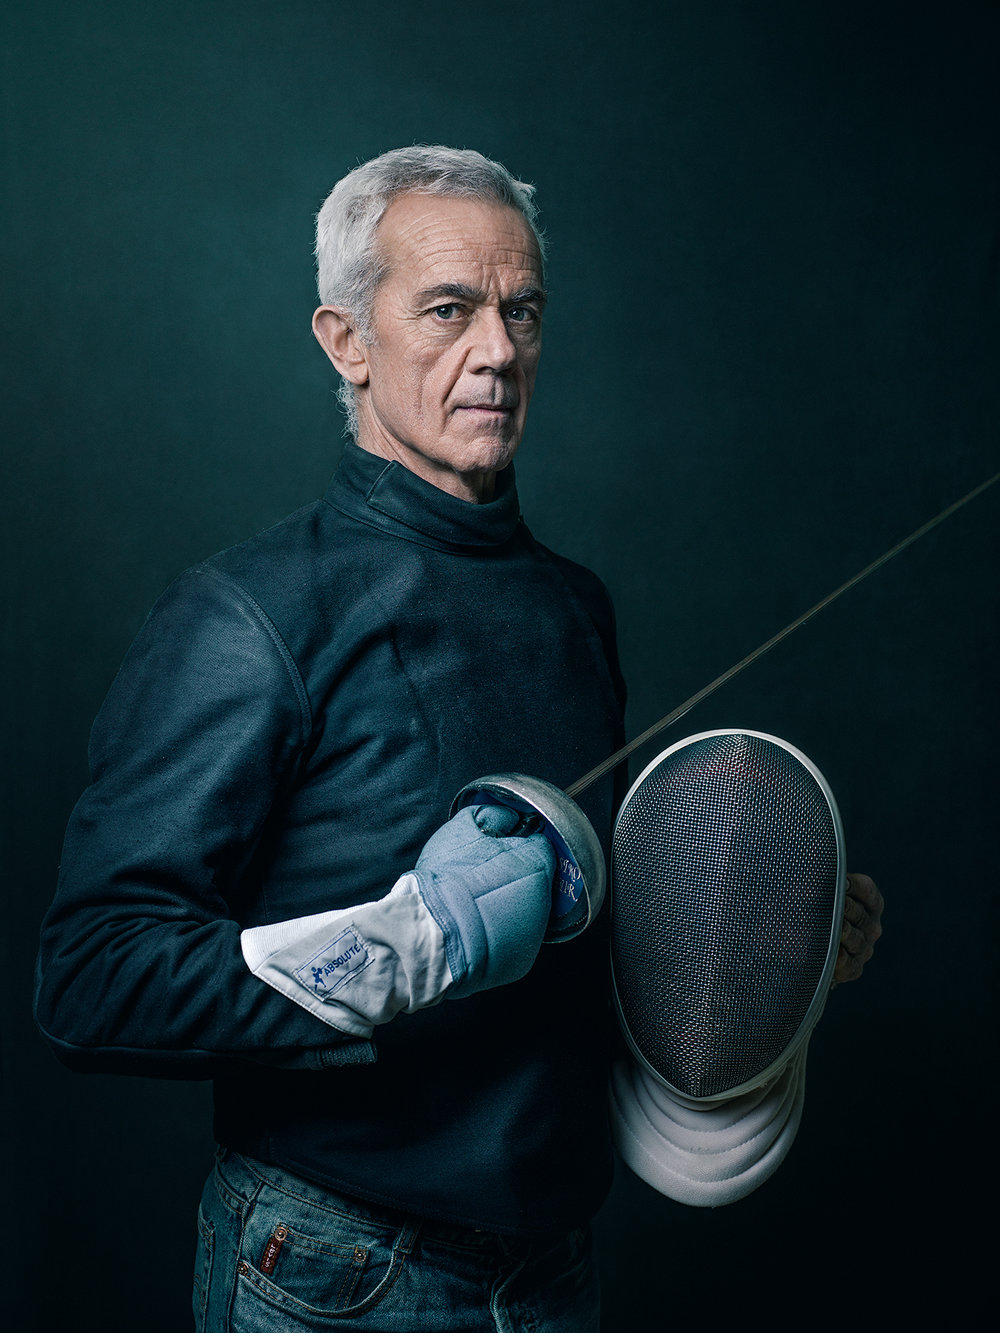 Oscar-arribas-esgrima-maestro-fencing-master-fencer-fechten-scherma-escrime-portrait-fotografo-retrato-photographer025.jpg